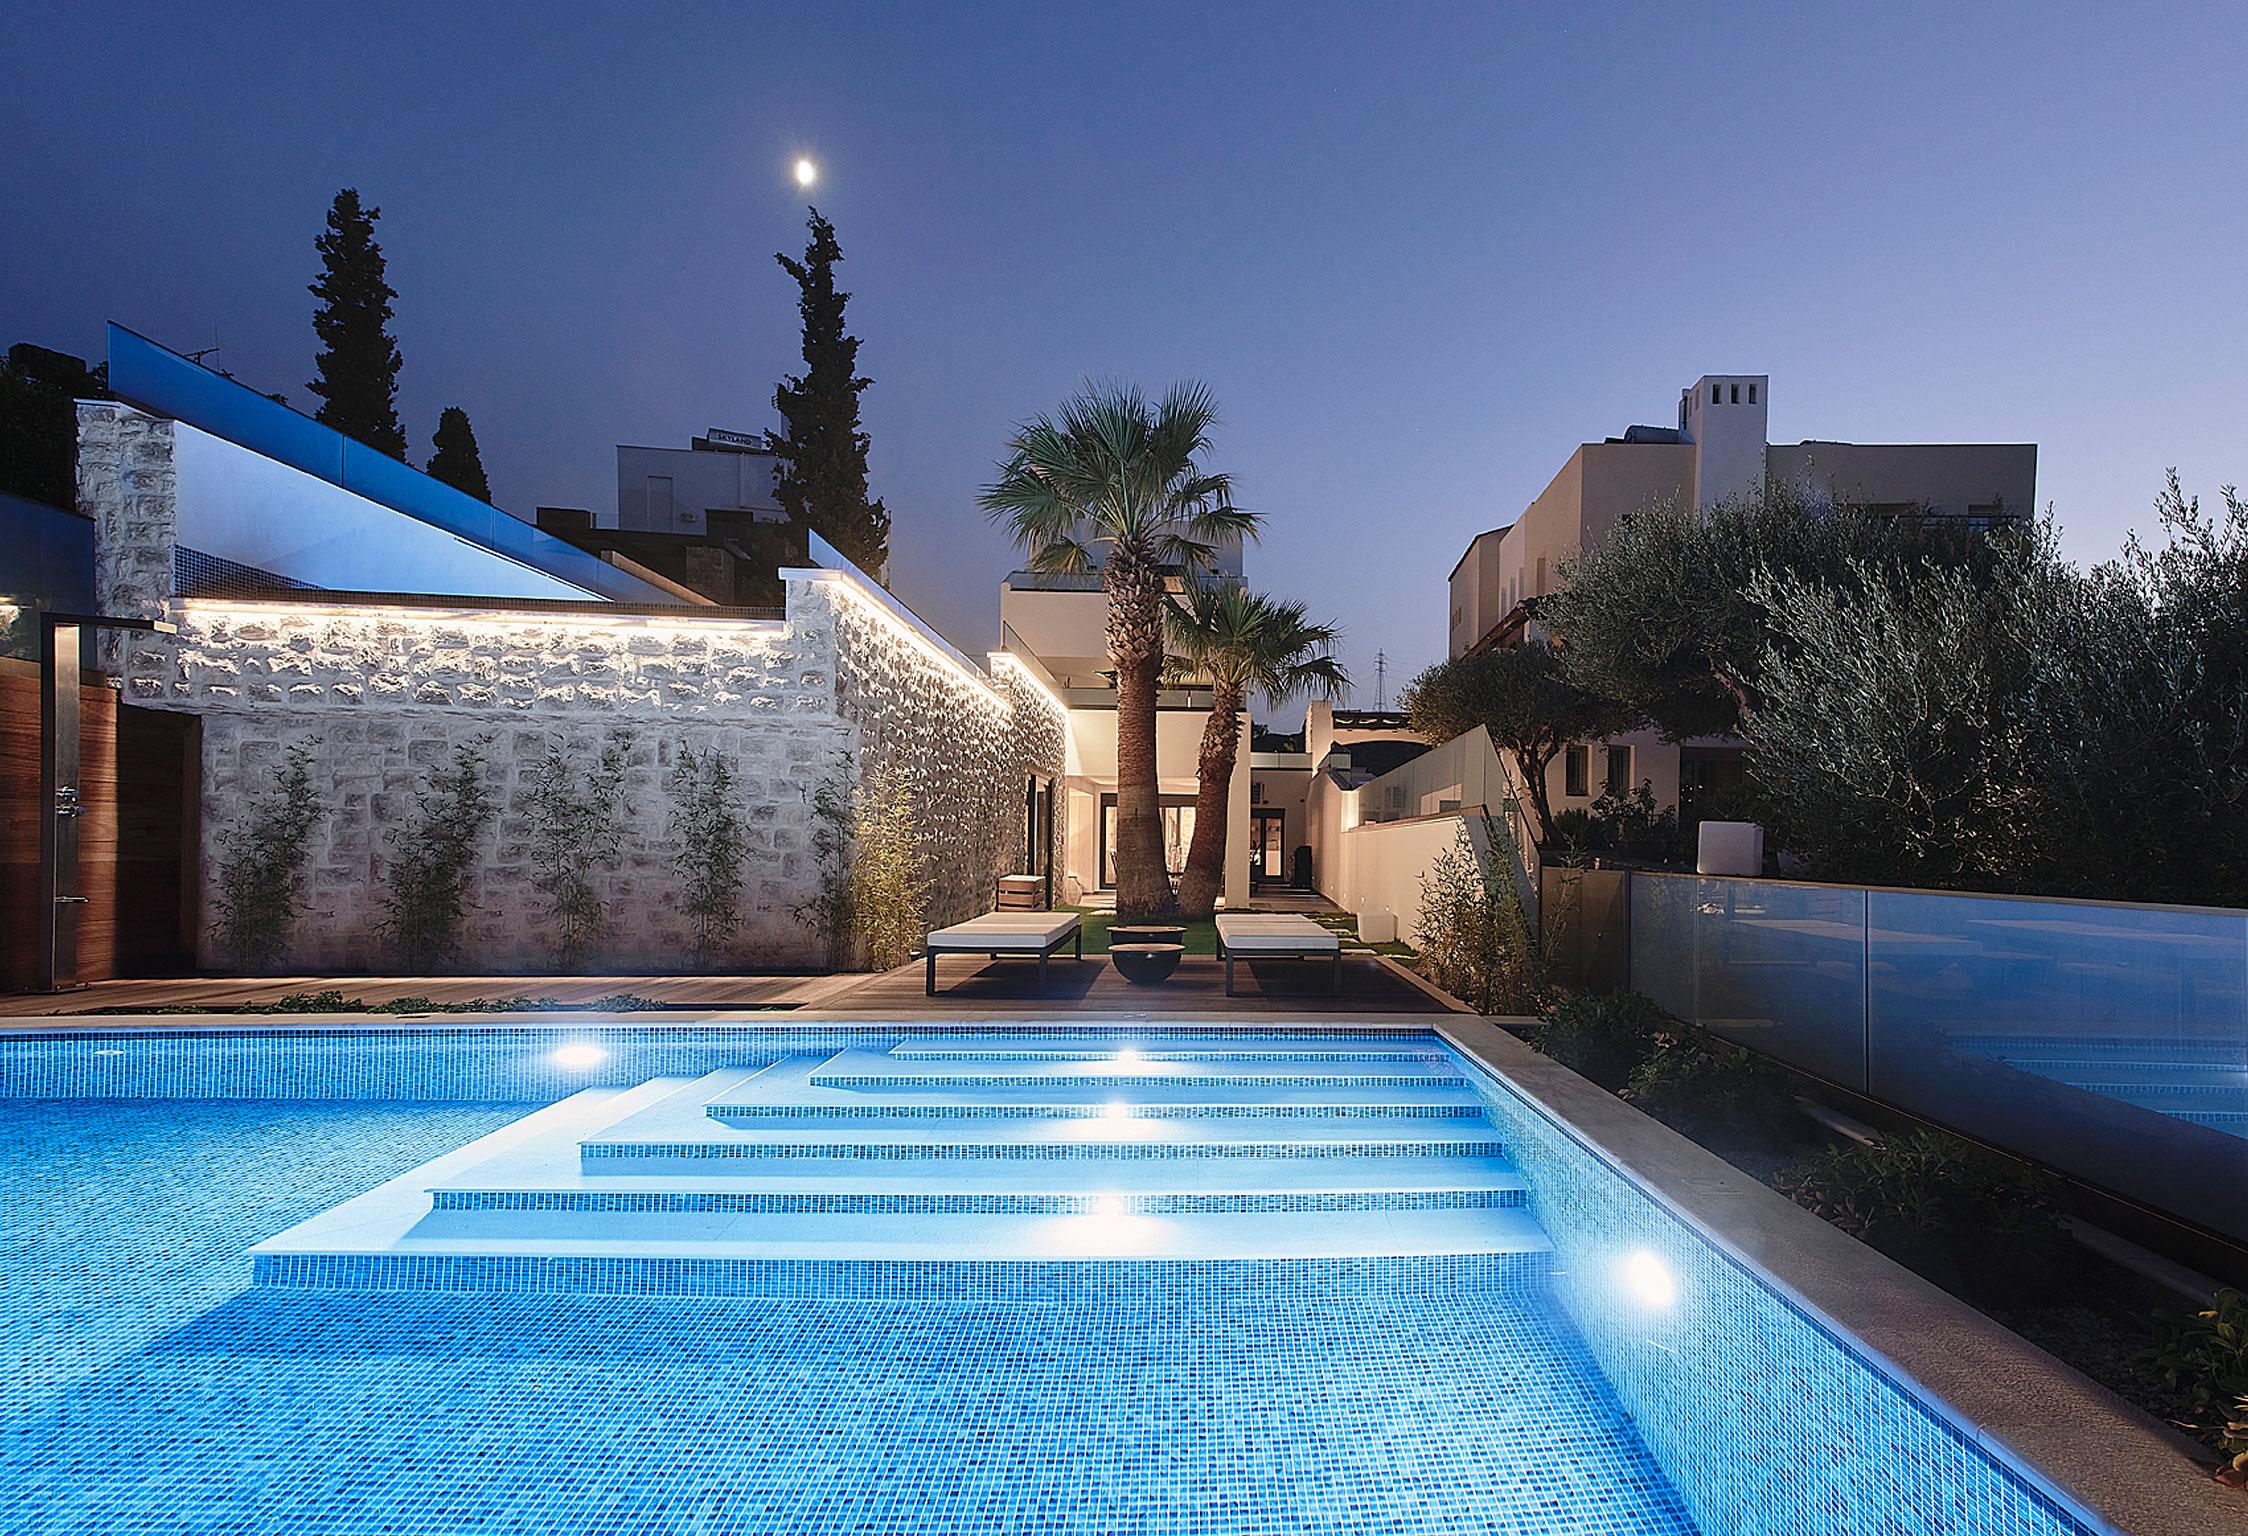 Crete Villa Naomi jumbotron image